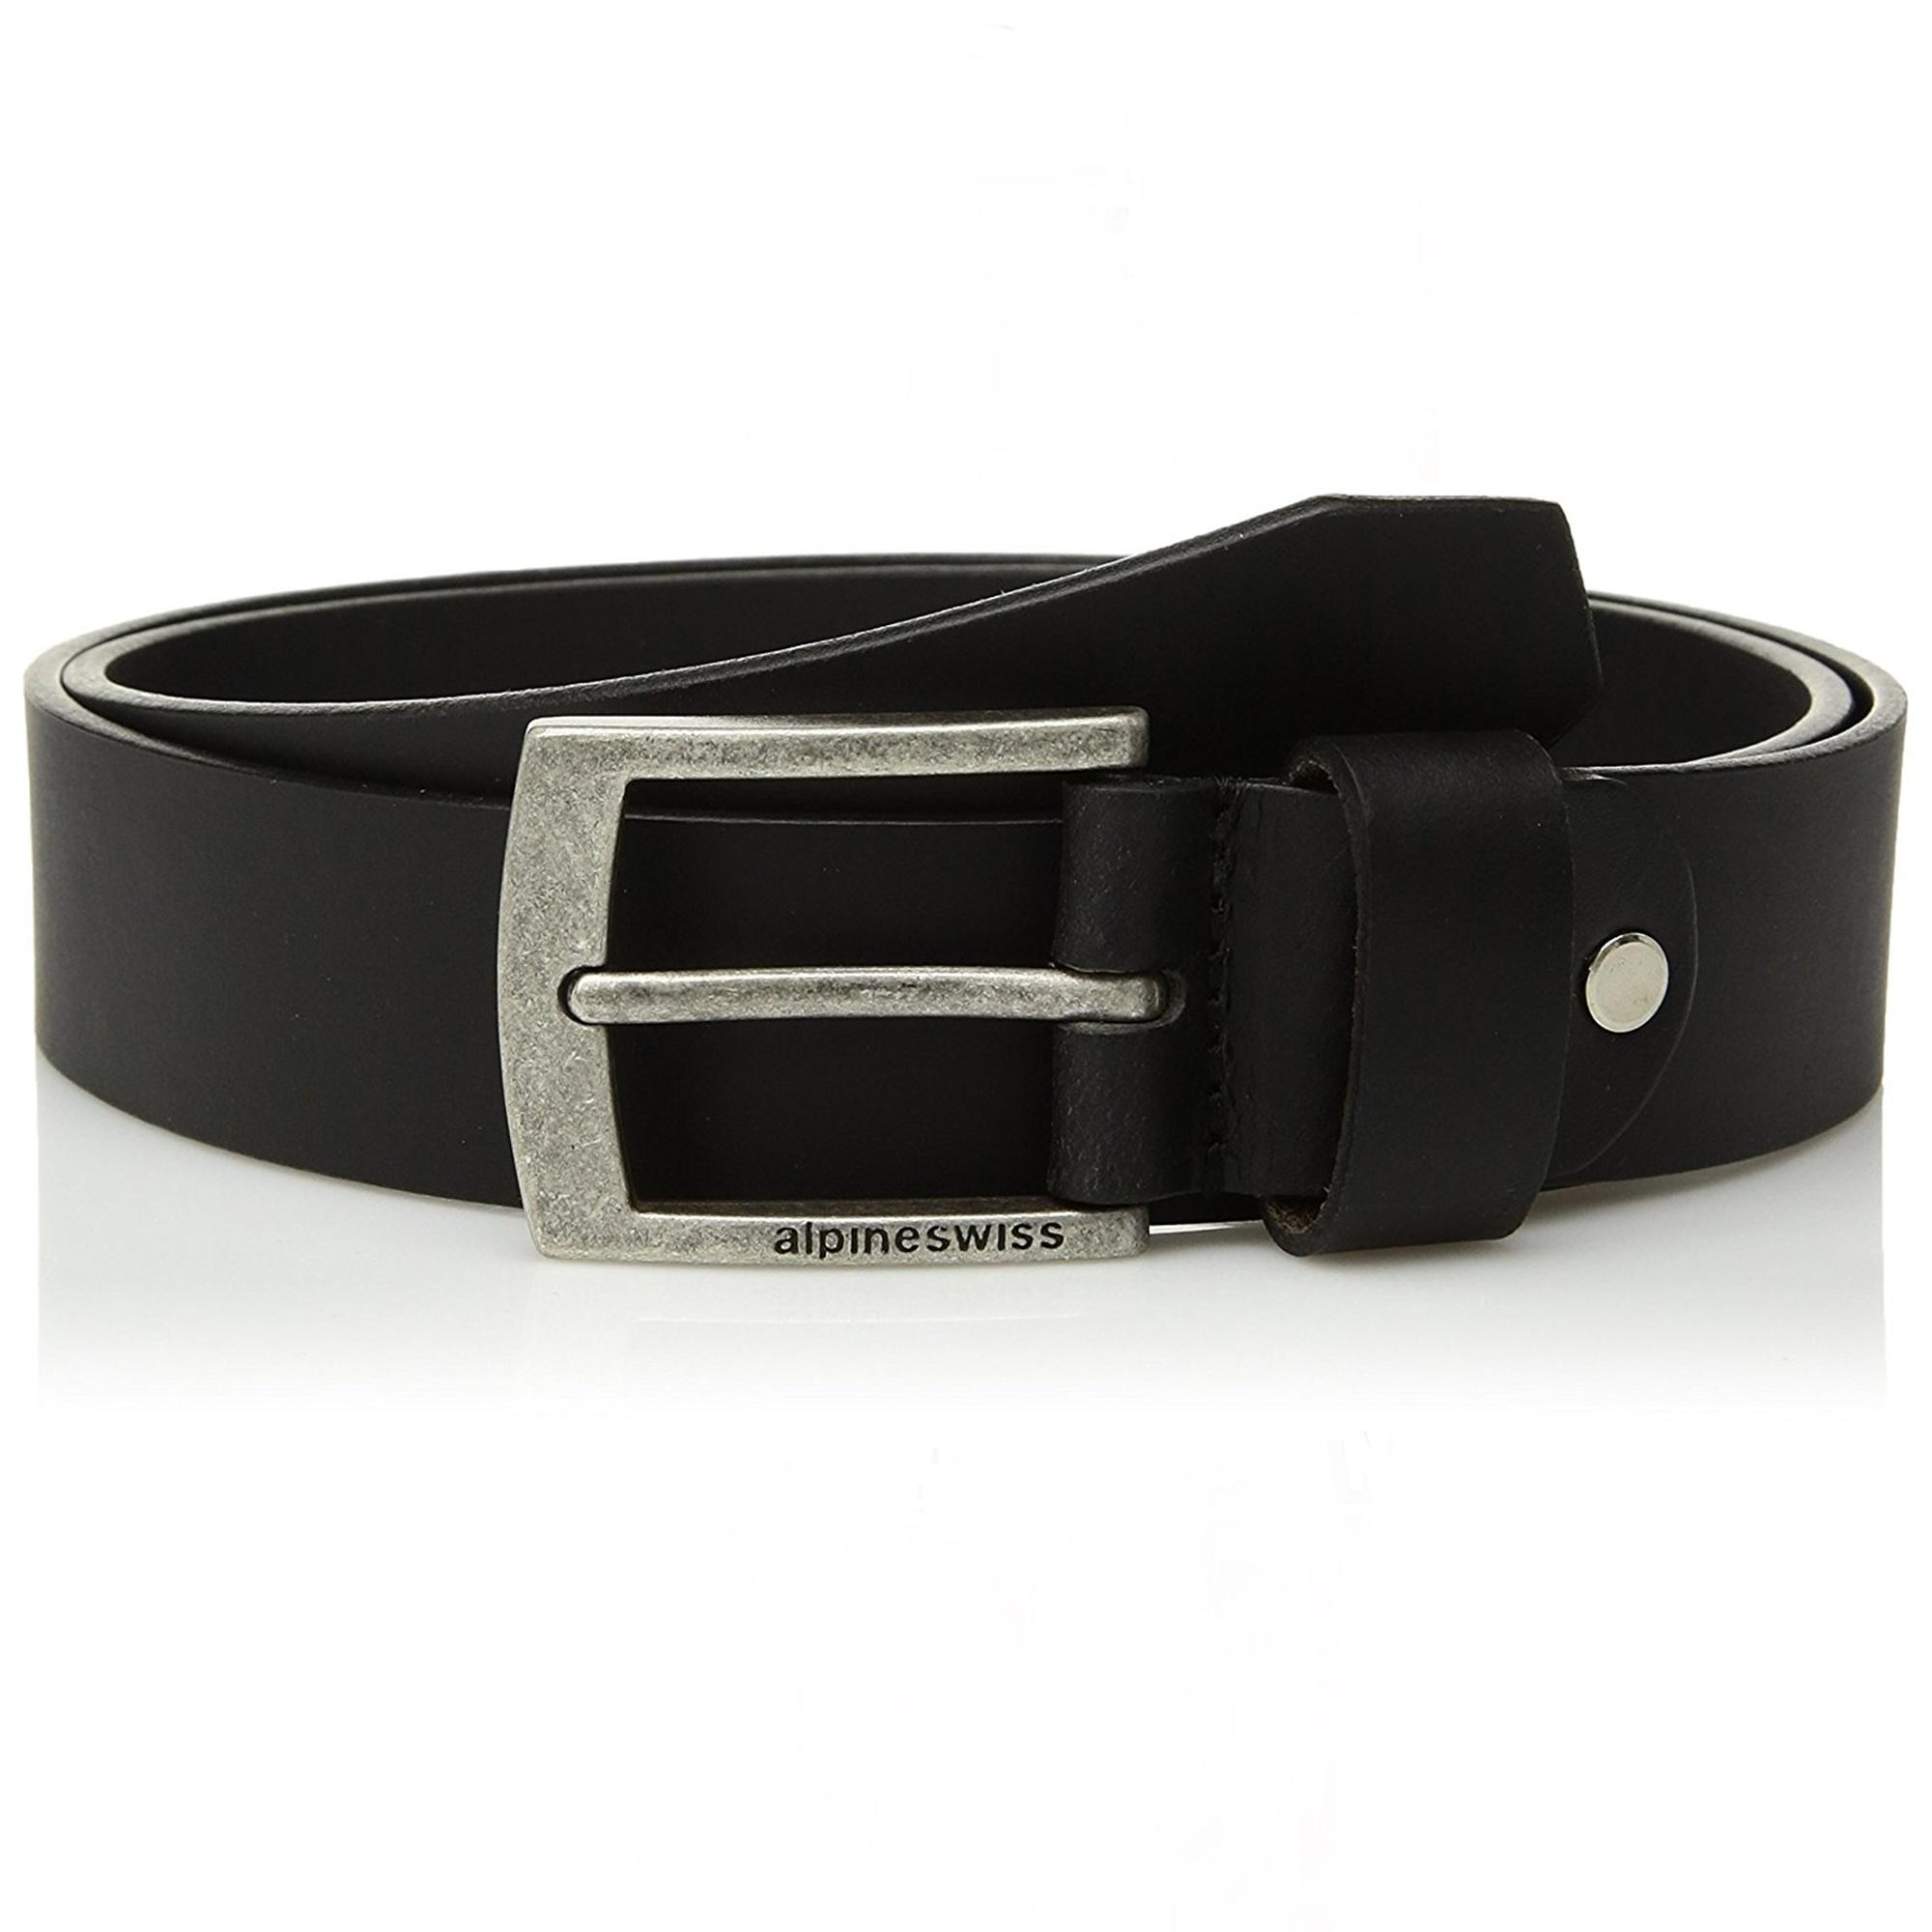 "7275ac643 Alpine Swiss Mens Leather Belt Slim 1 1/4"" Casual Jean Dakota Signature  Buckle"